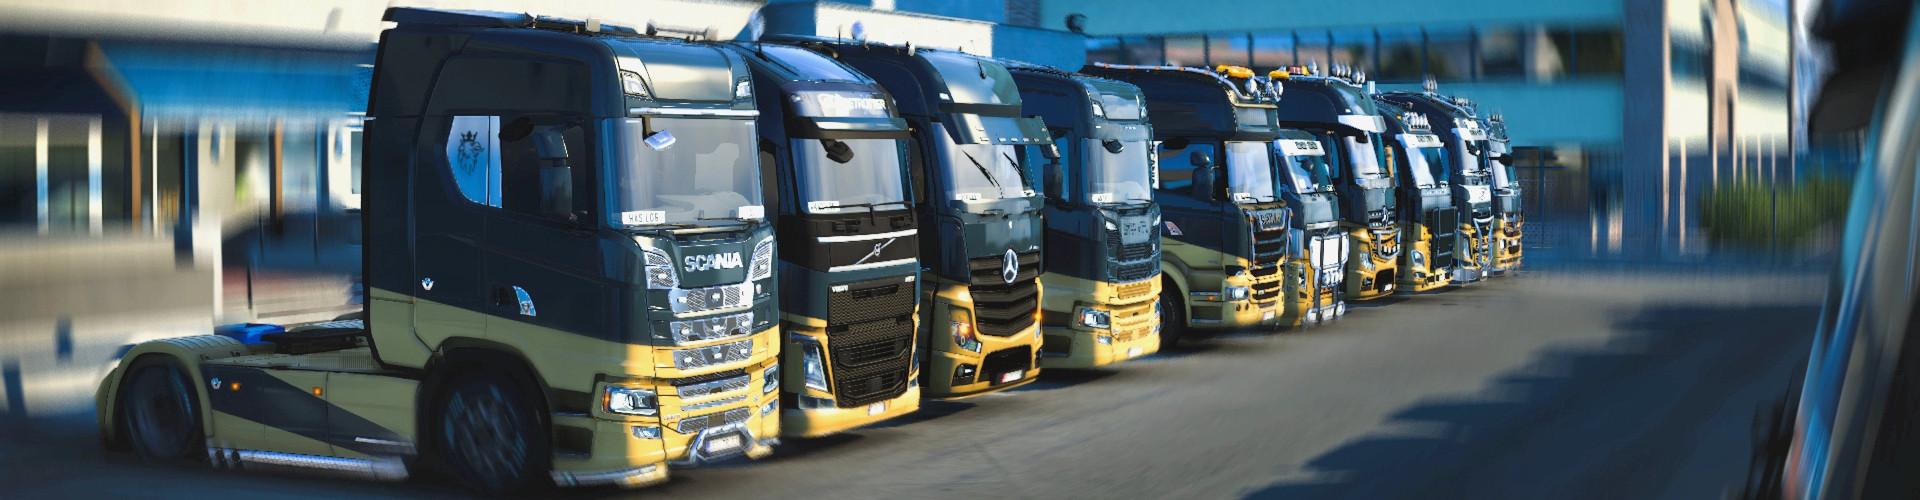 Has Logistics 2nd Anniversary Convoy